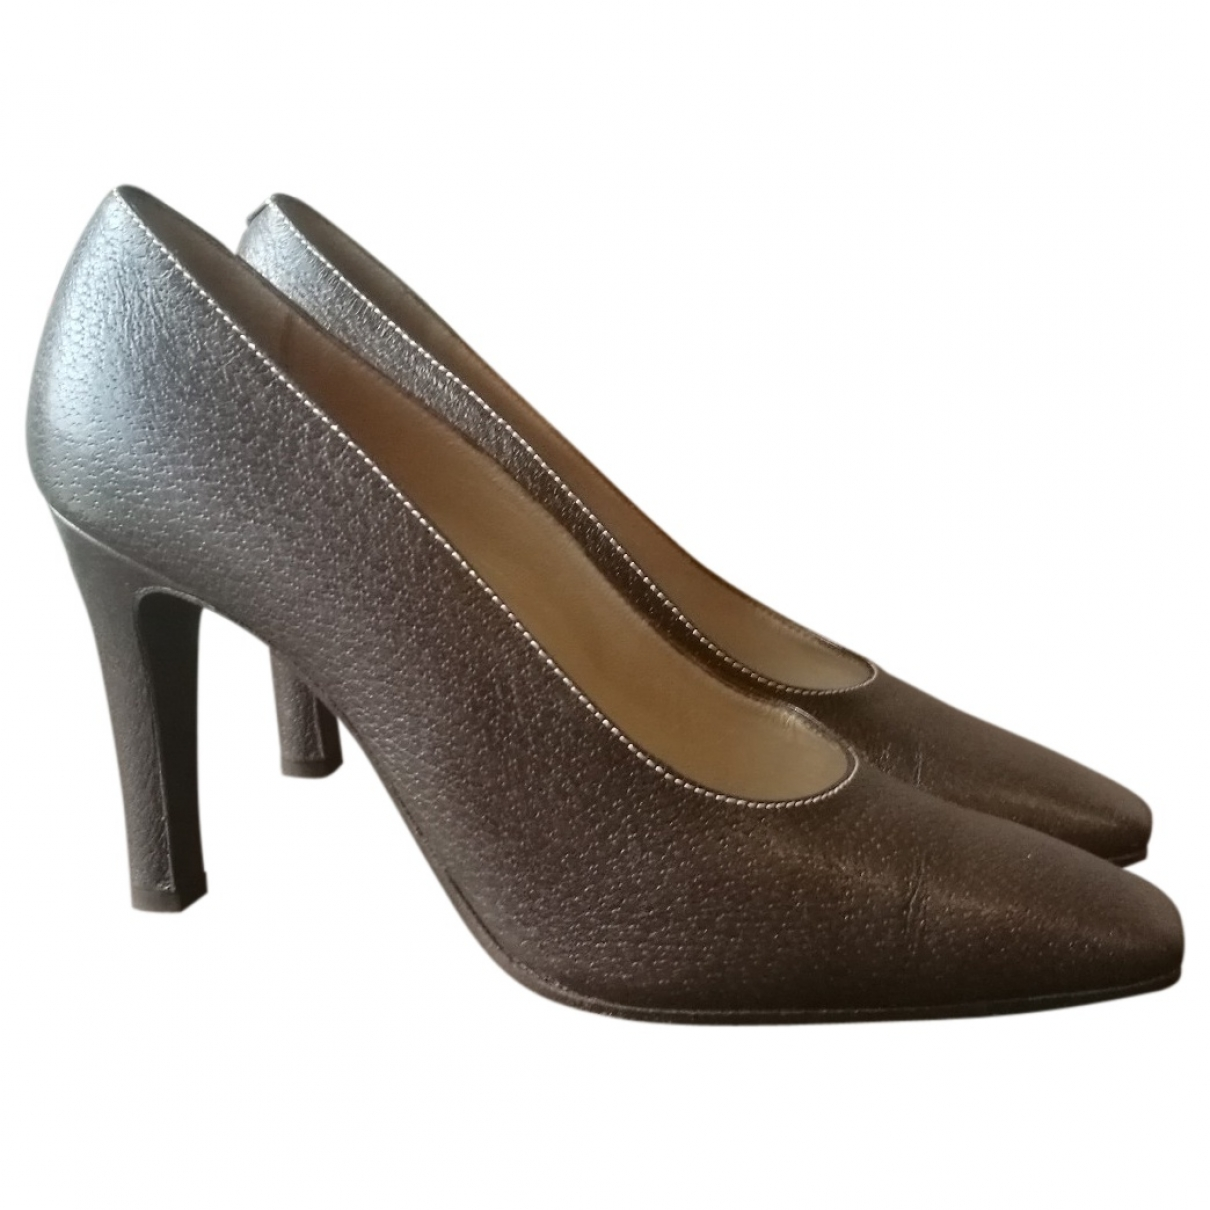 Valentino Garavani - Escarpins   pour femme en cuir - marron